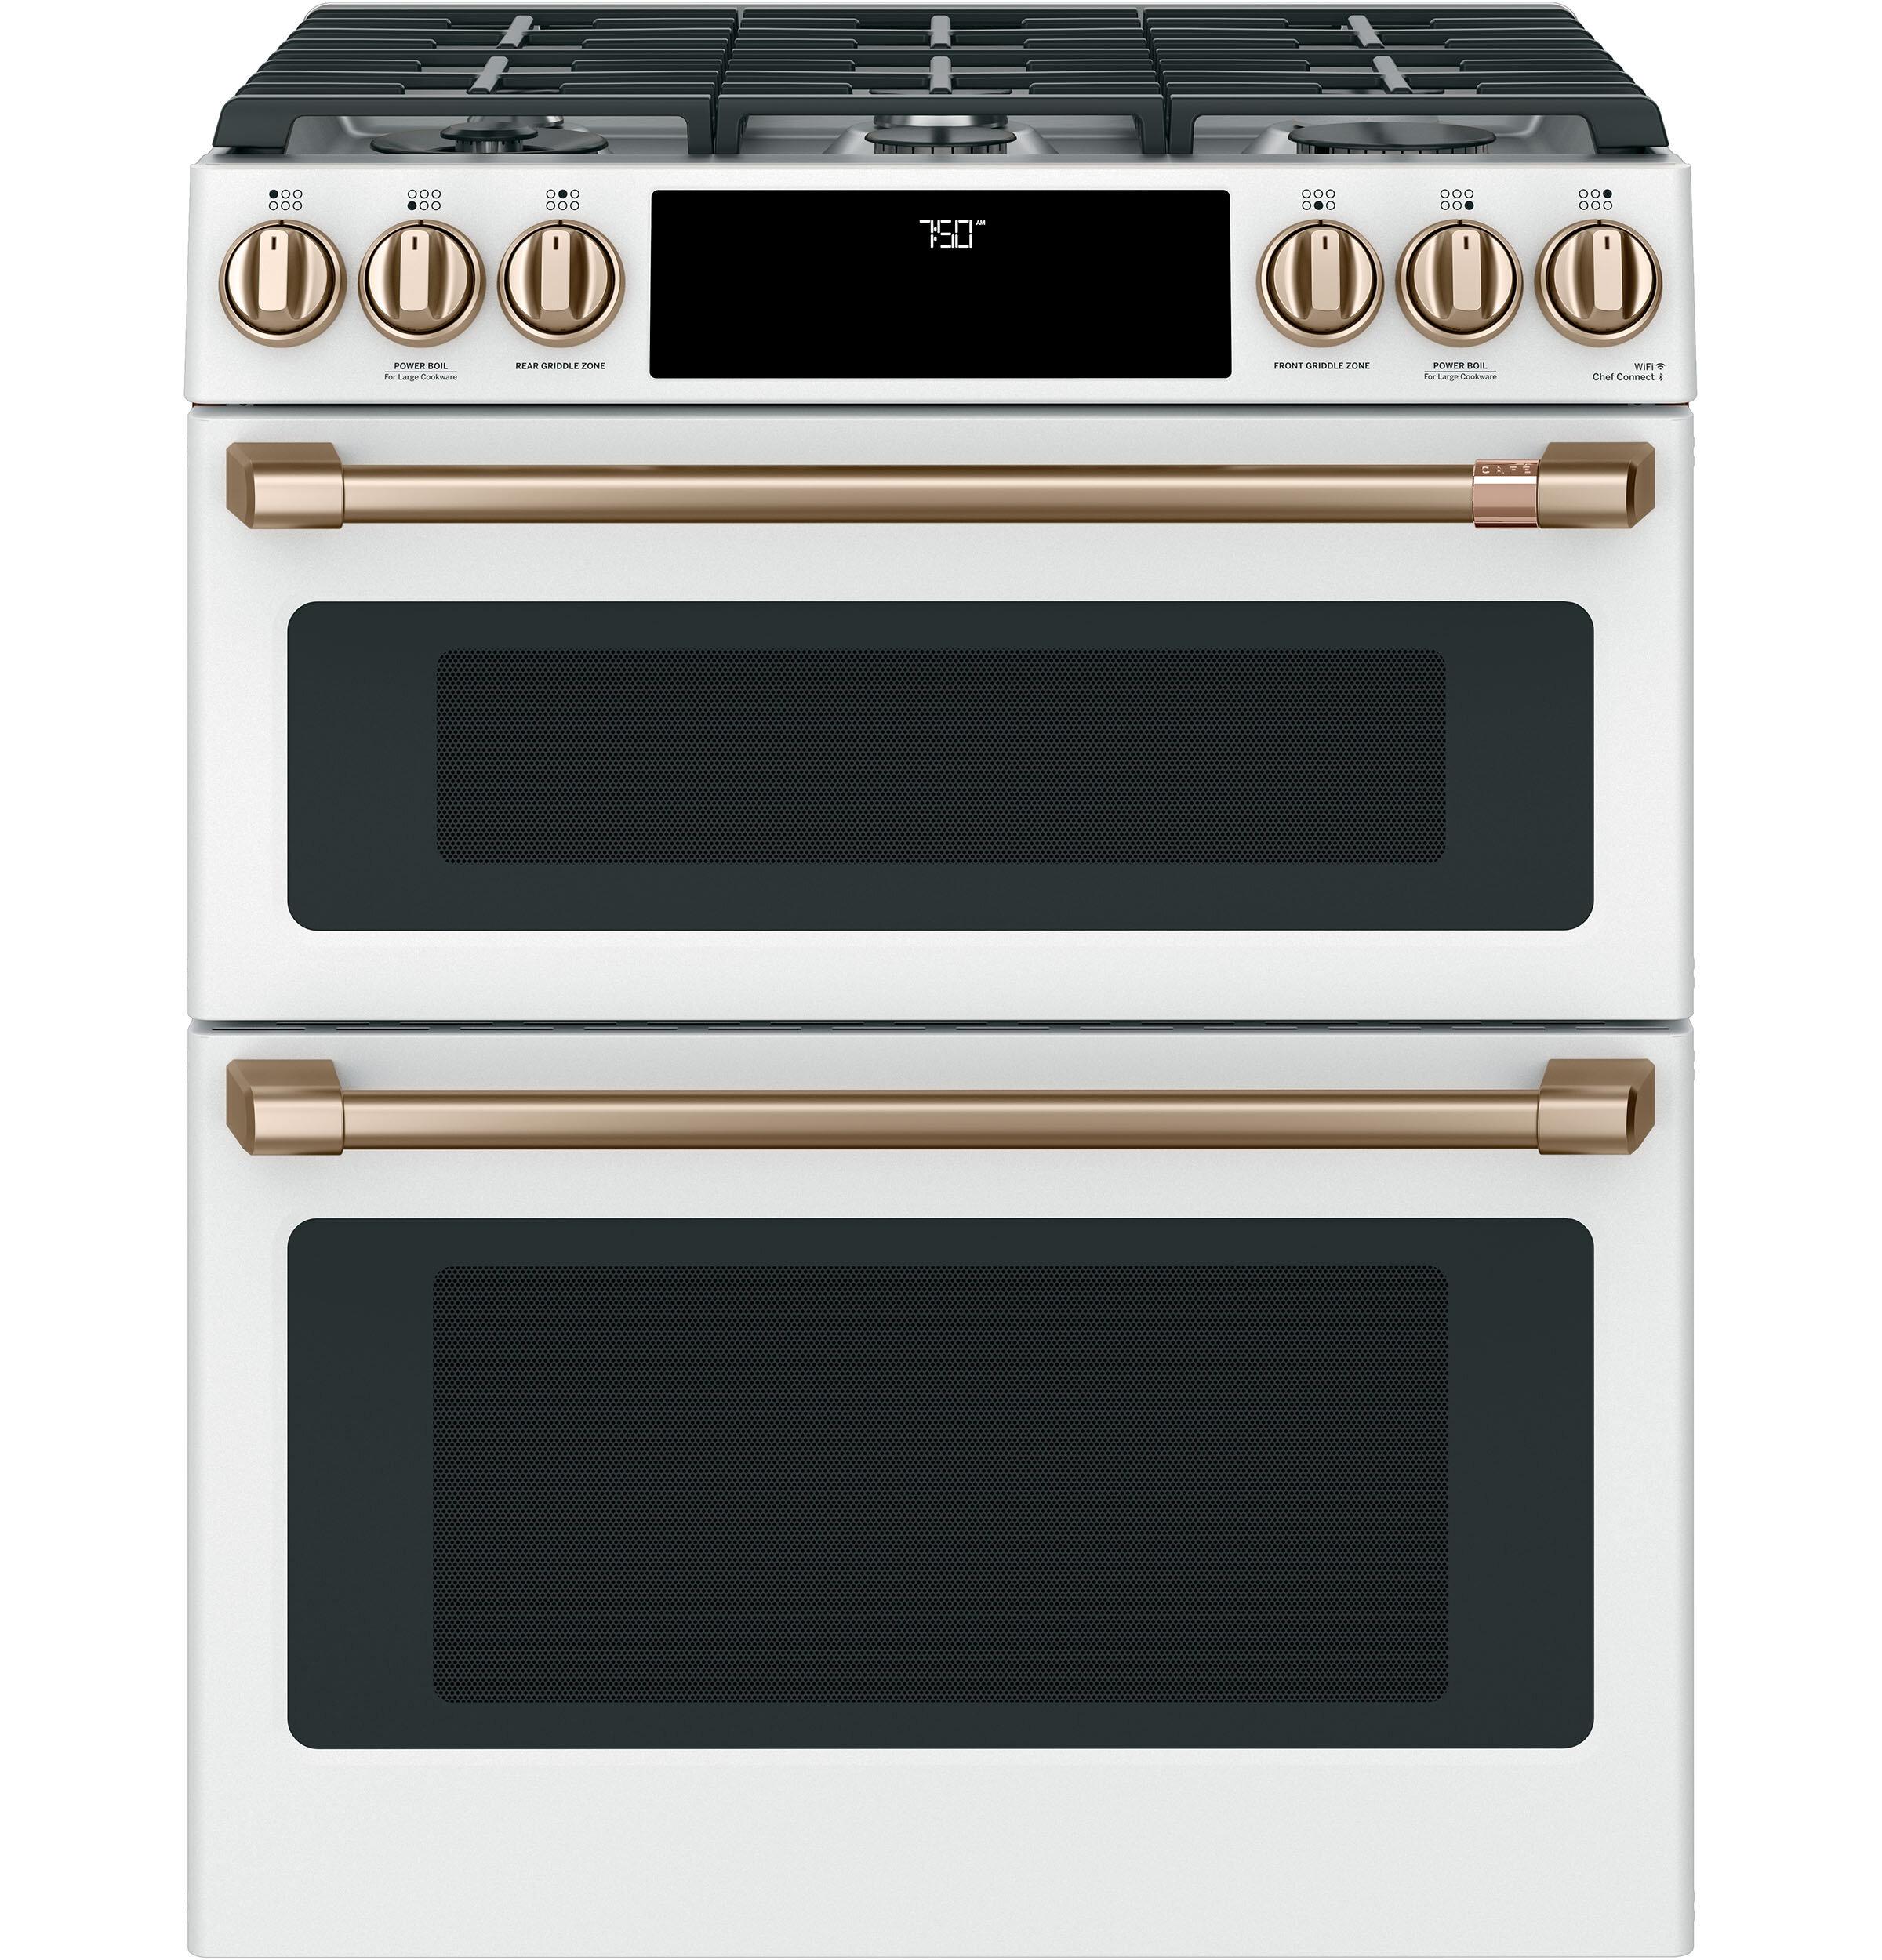 Kitchen Stove 2 Pots Ranges Part Heavy Duty Cast Iron GE Gas Range Grate 30 in